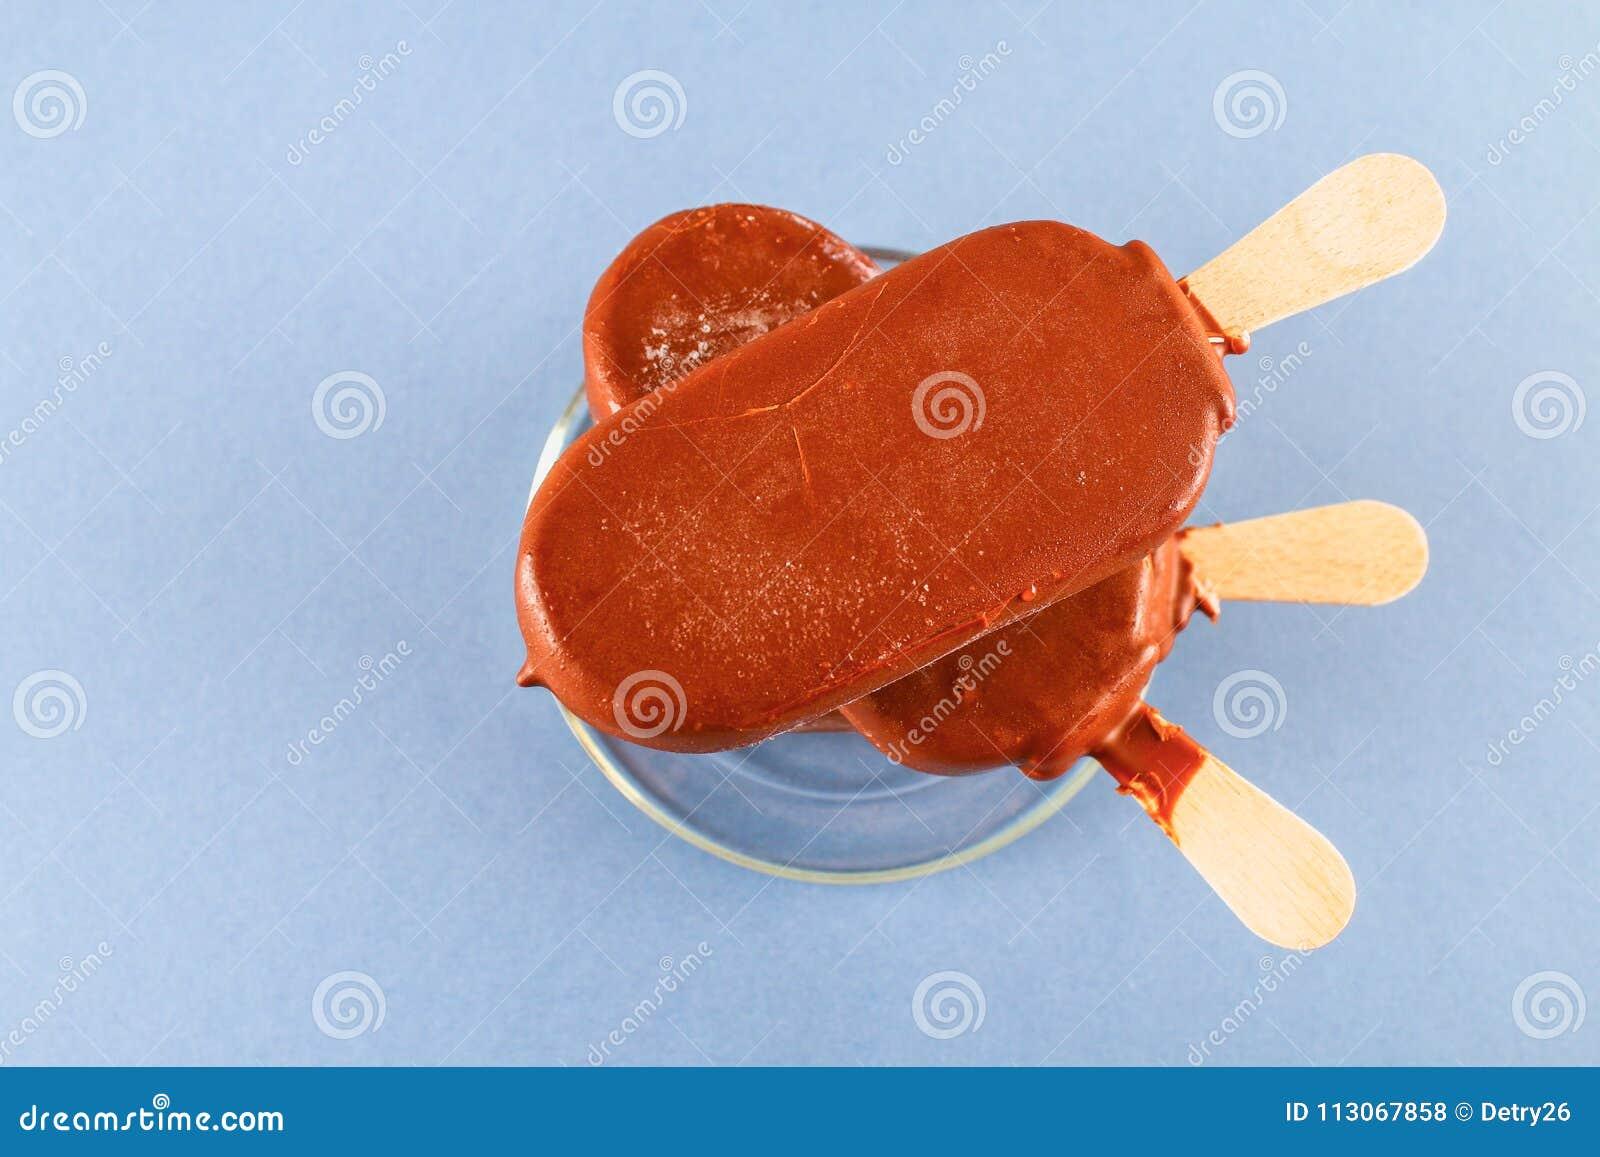 Ice cream on a glass saucer on a gray table. Eskimo.